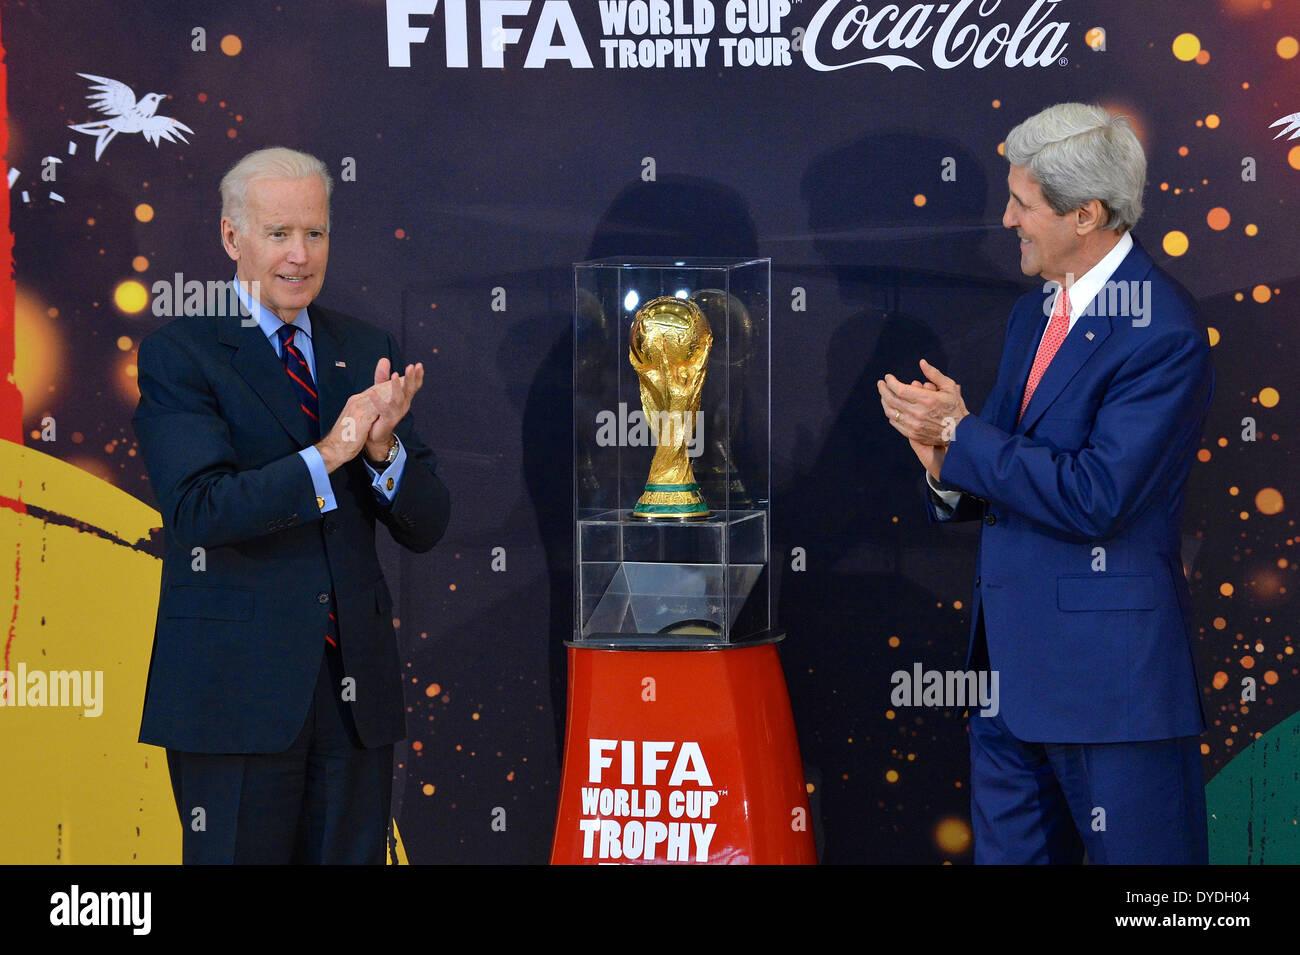 Washington DC, USA . 14th Apr, 2014. US Vice President Joe Biden and Secretary of State John Kerry unveil the FIFA Stock Photo